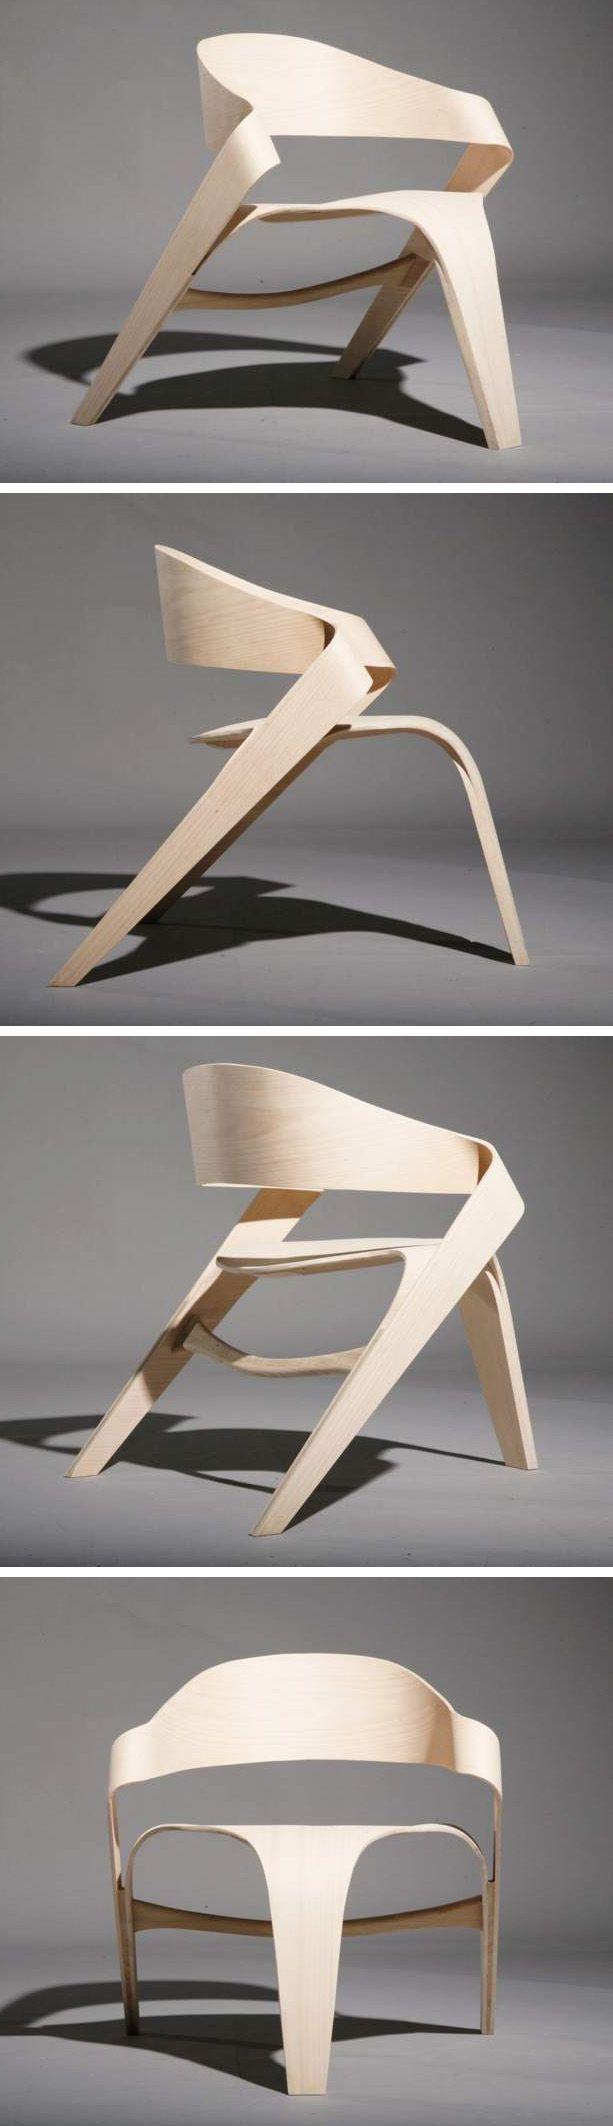 The Copenhagen Chair by Alvaro Uribe